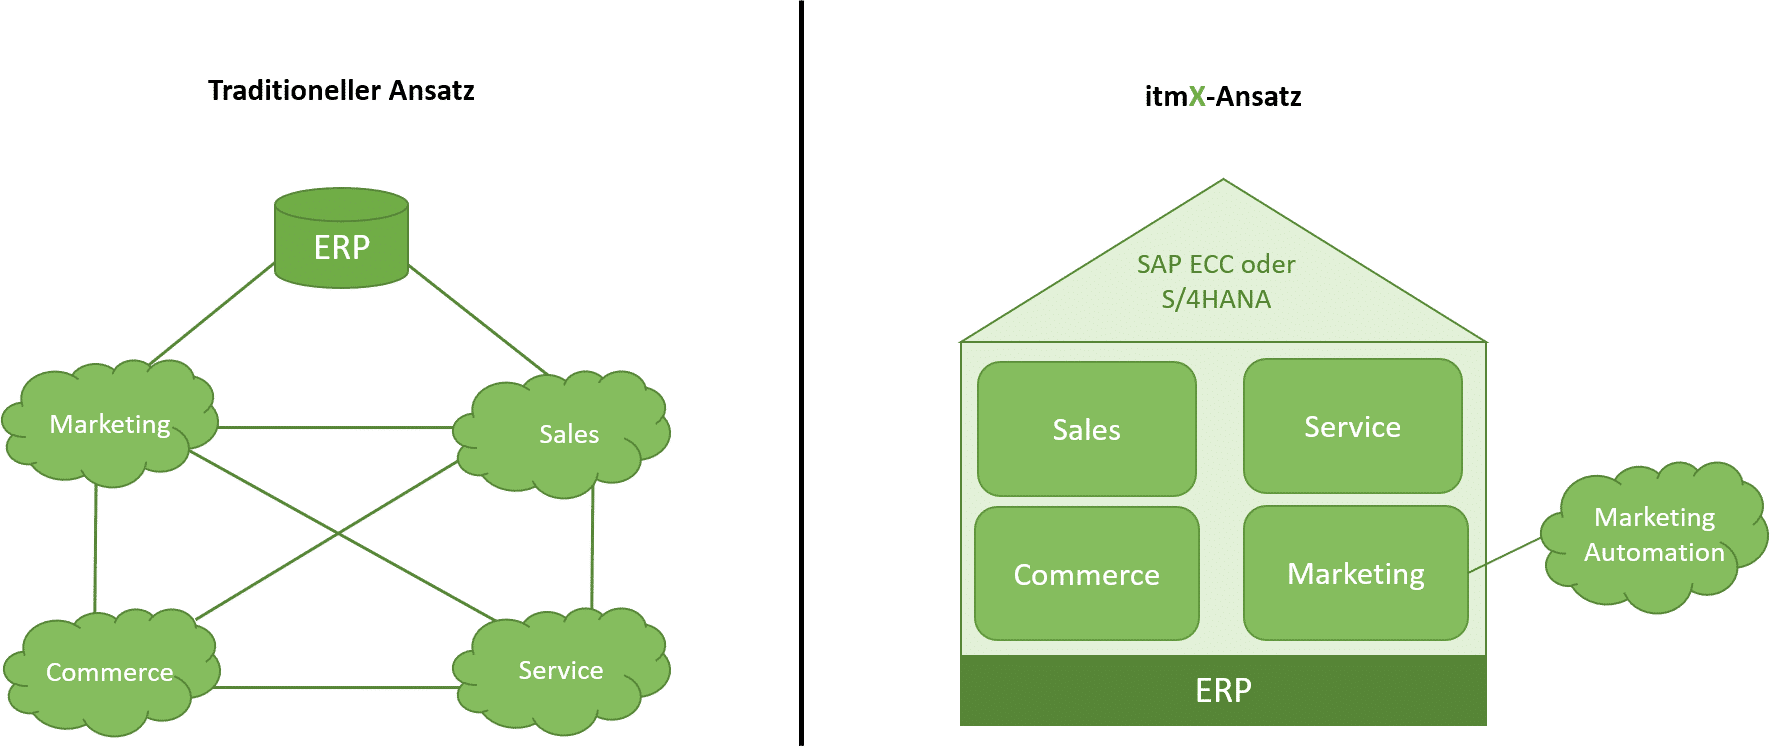 itmX integriertes CRM für SAP